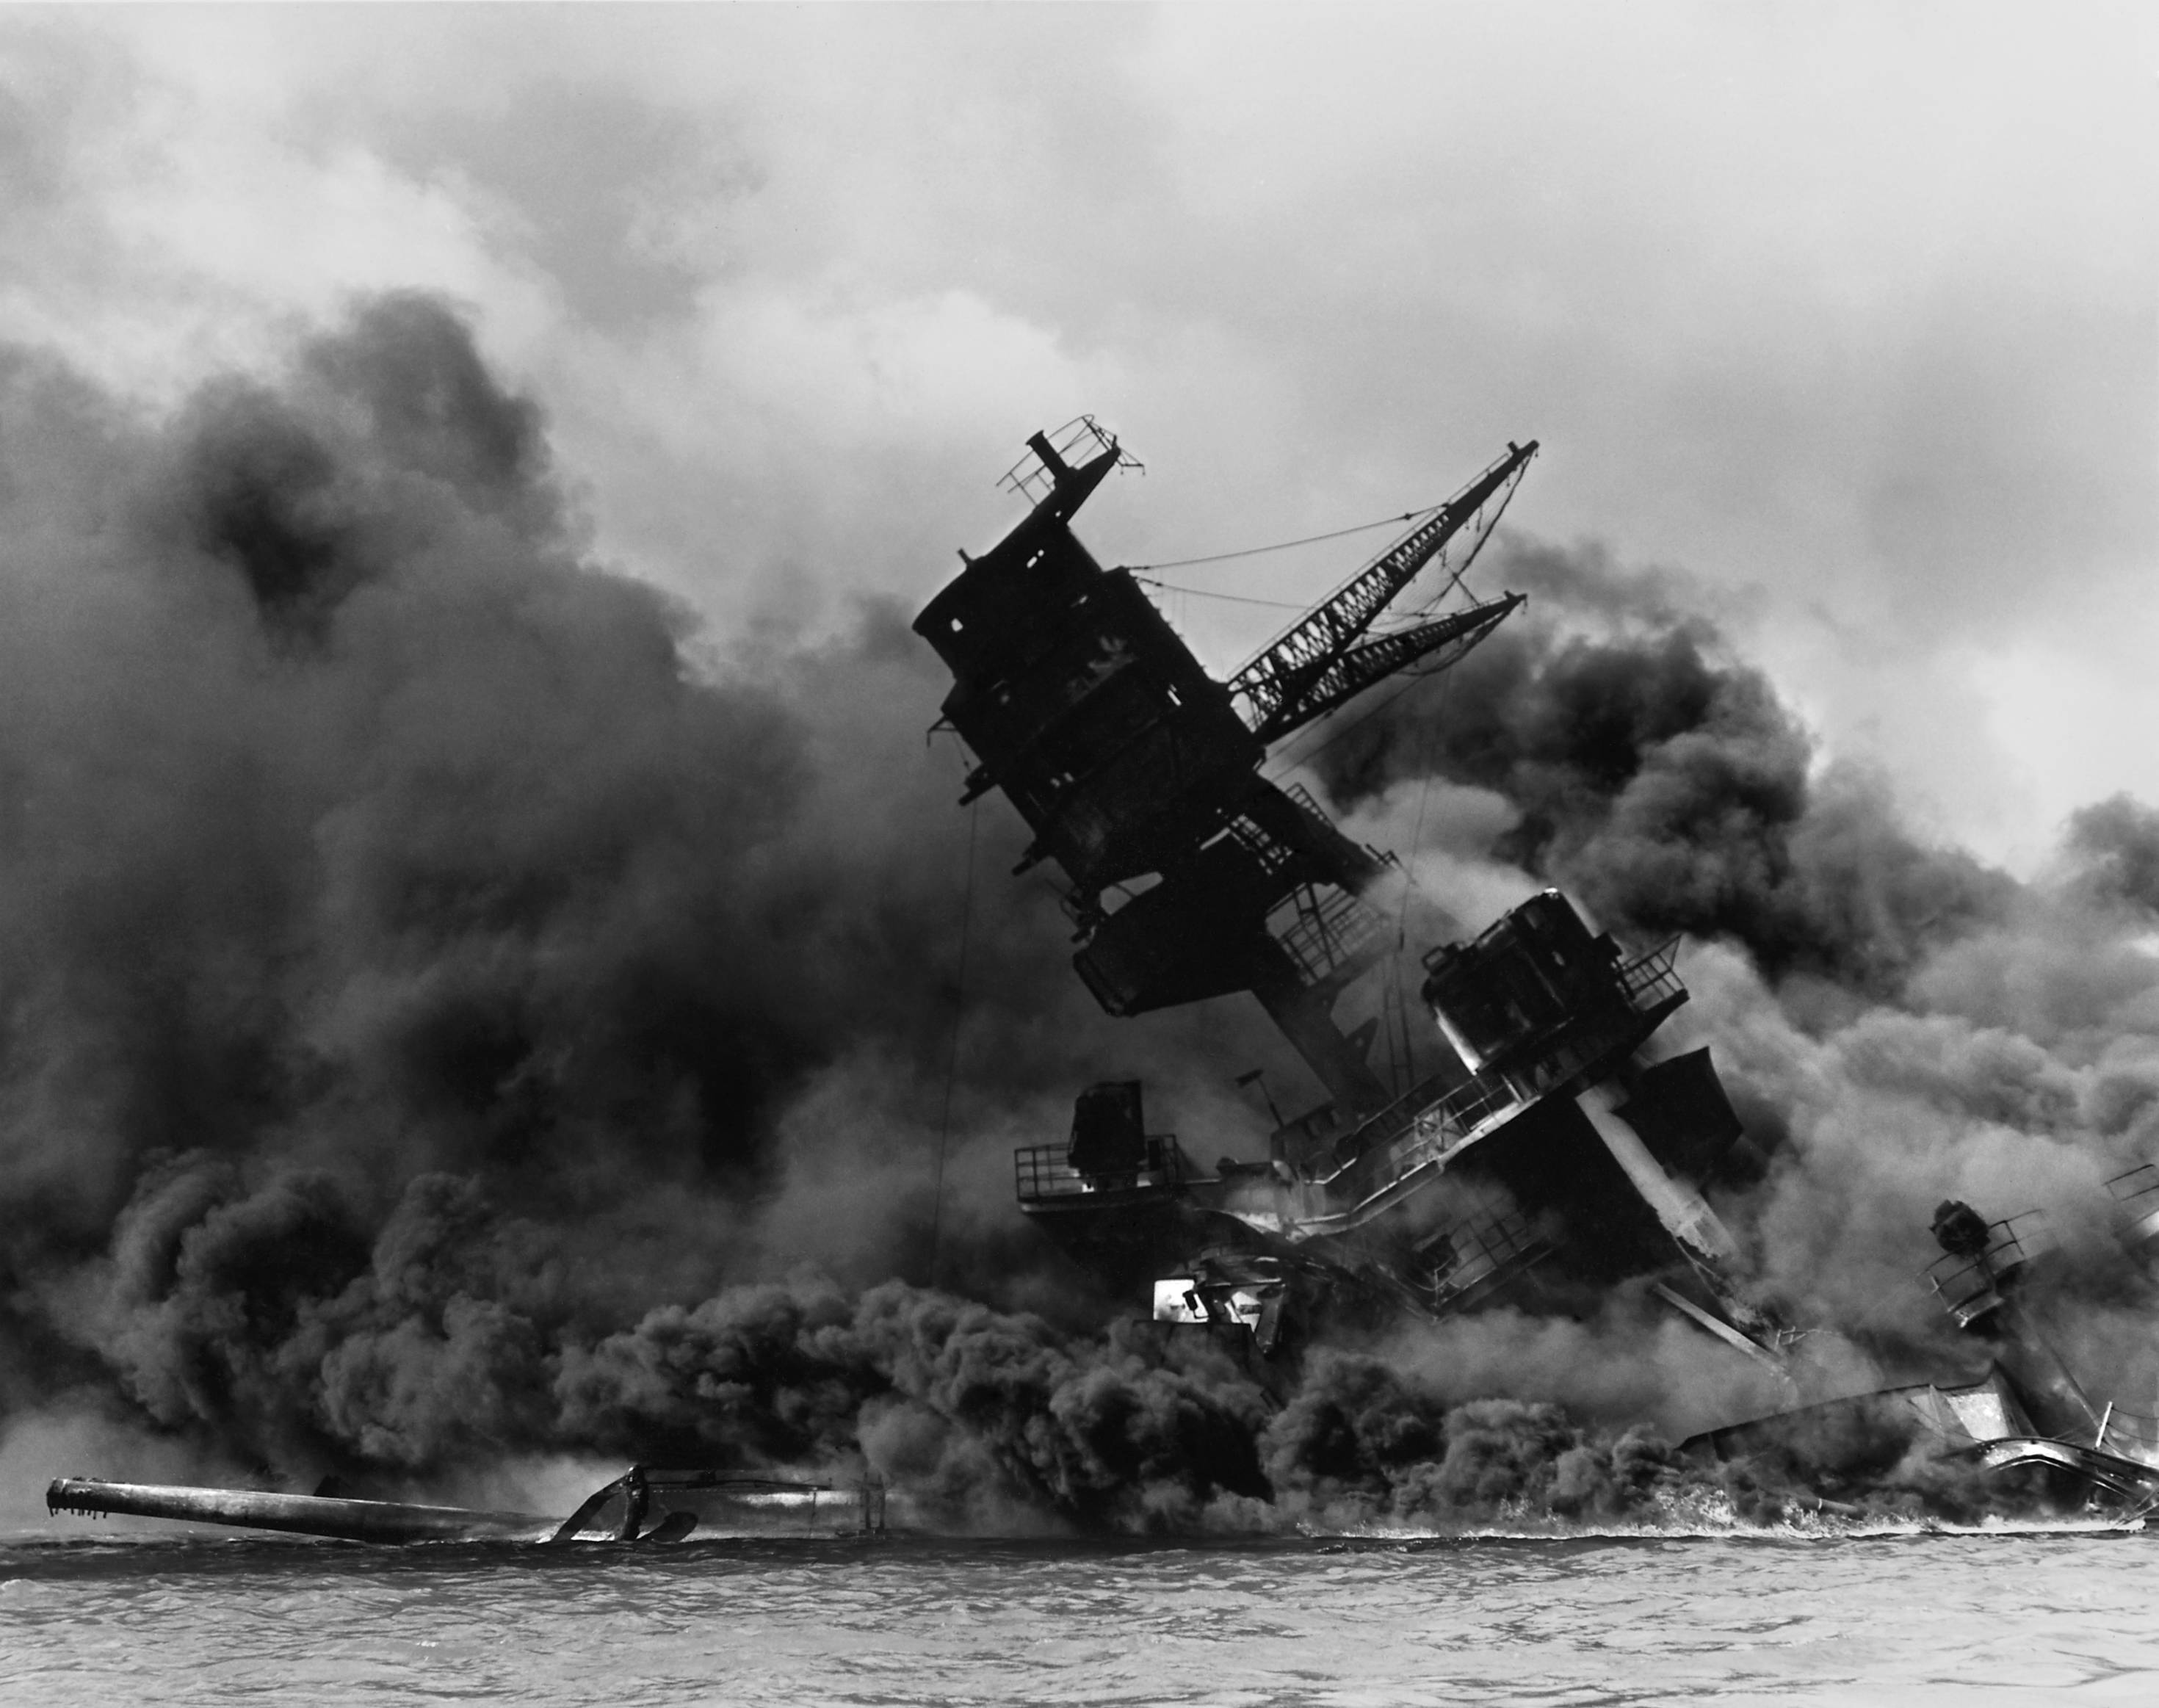 6a9ddc22c3d01c53ed63_Pearl_Harbor_-_USS_Arizona_burning_after_Japanese_attack_-_wikipedia.jpg